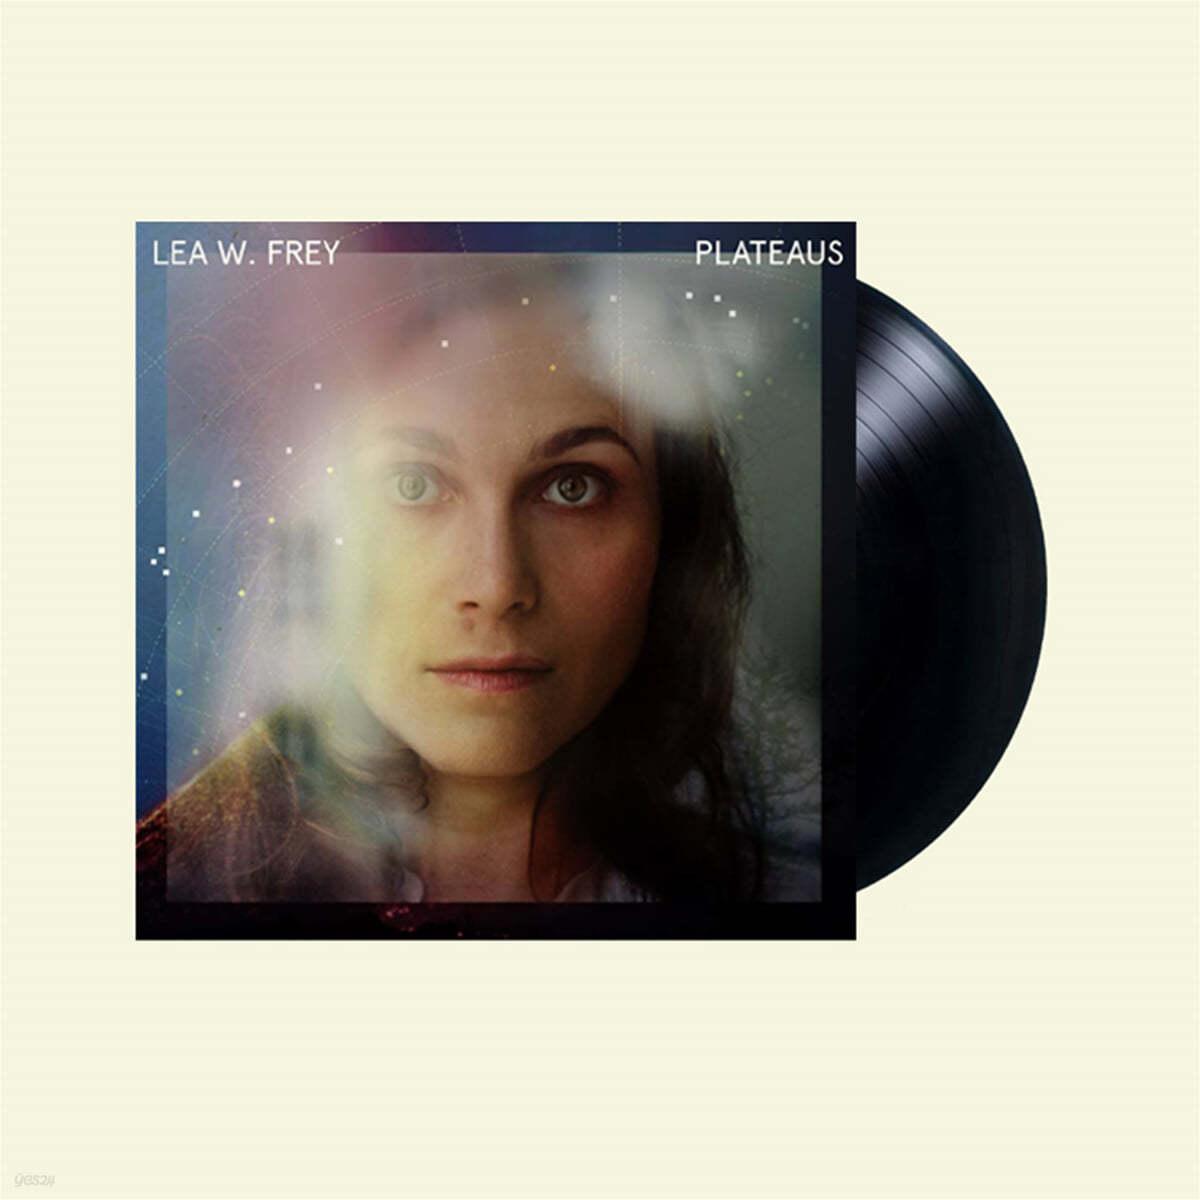 Lea W. Frey (레아 W. 프레이) - Plateaus [LP]